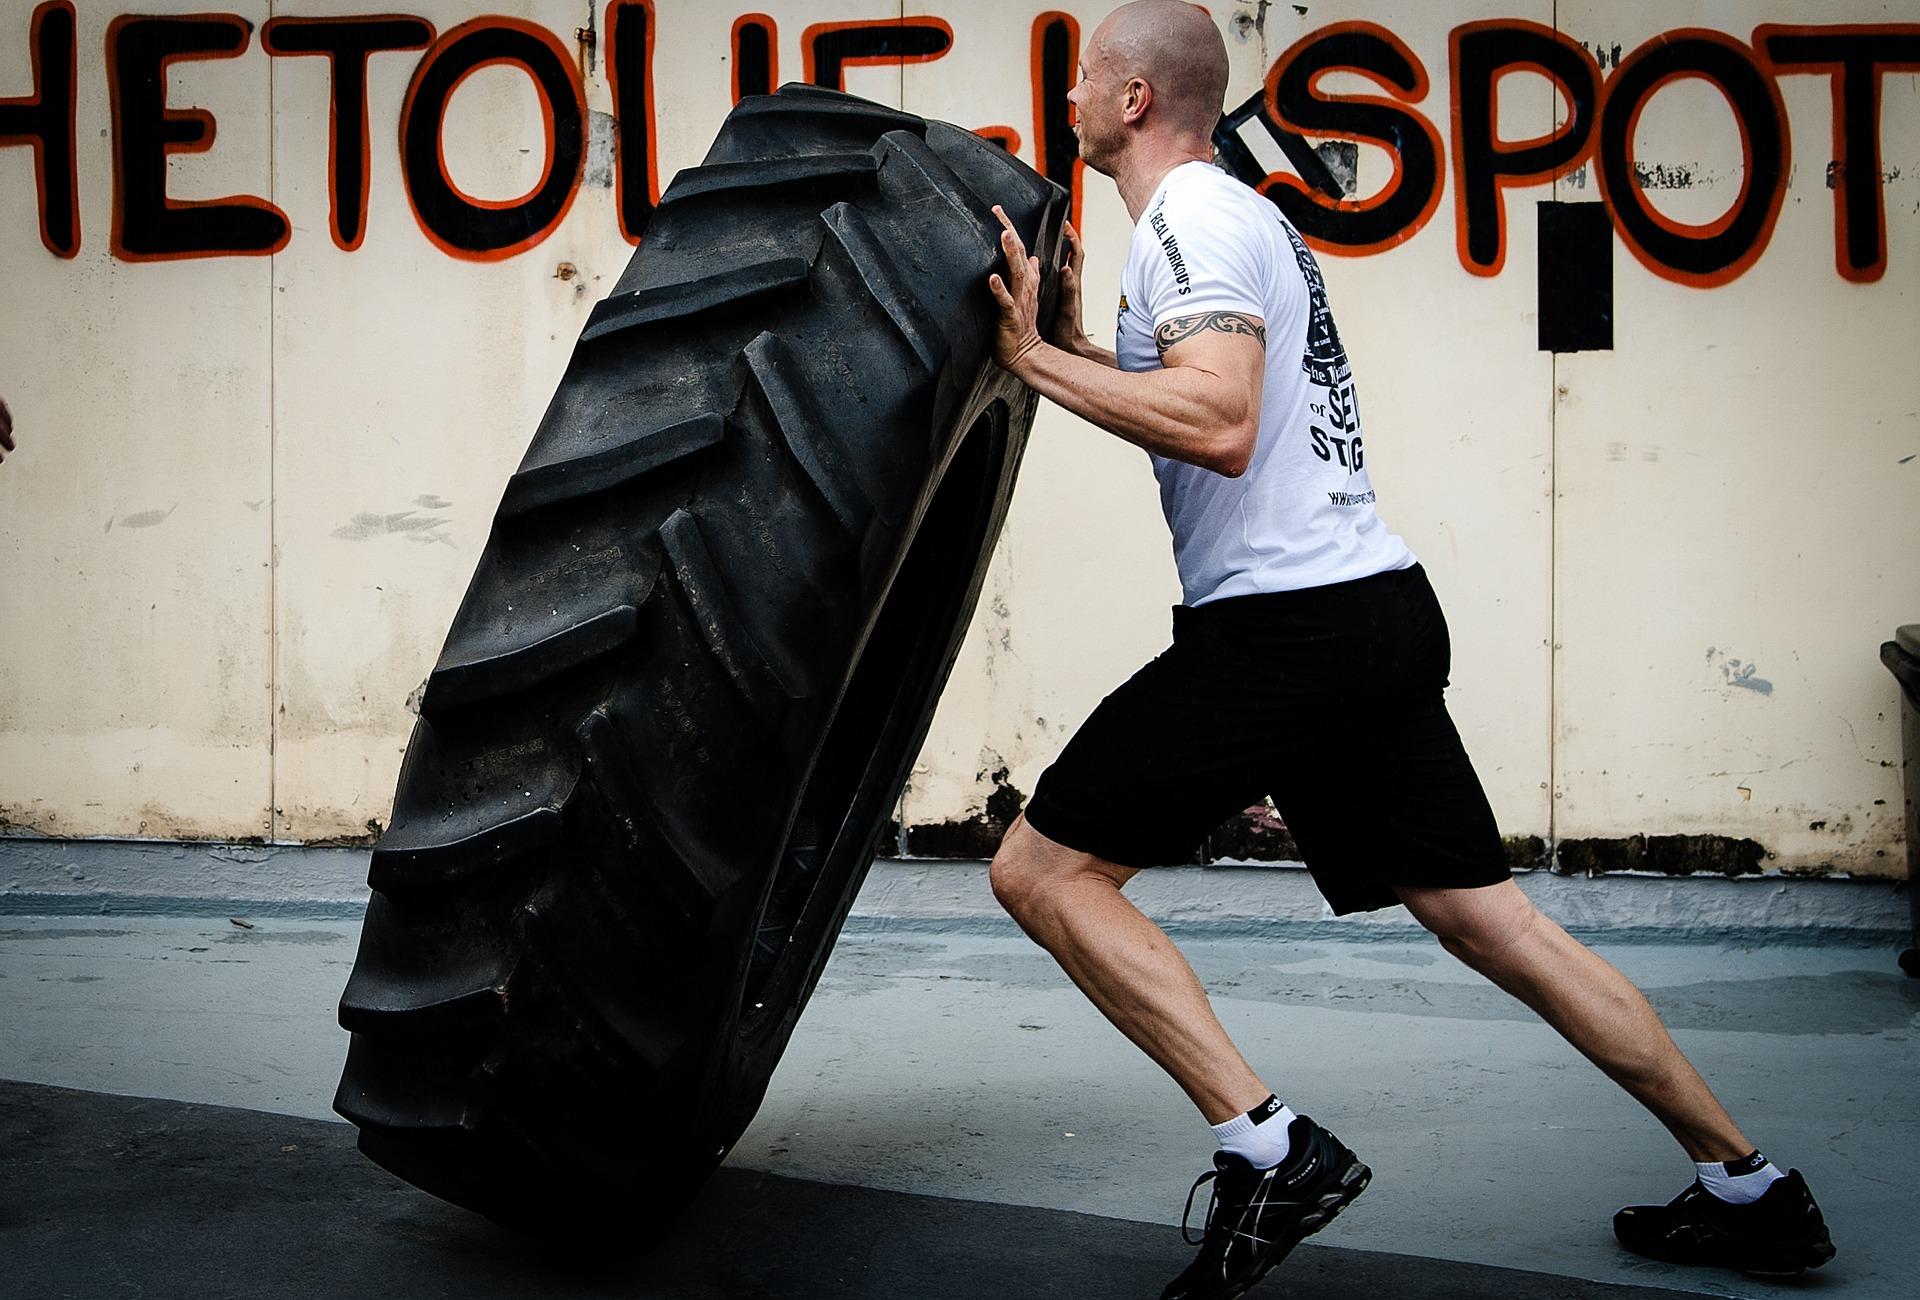 tyre-flipping-2141109_1920.jpg